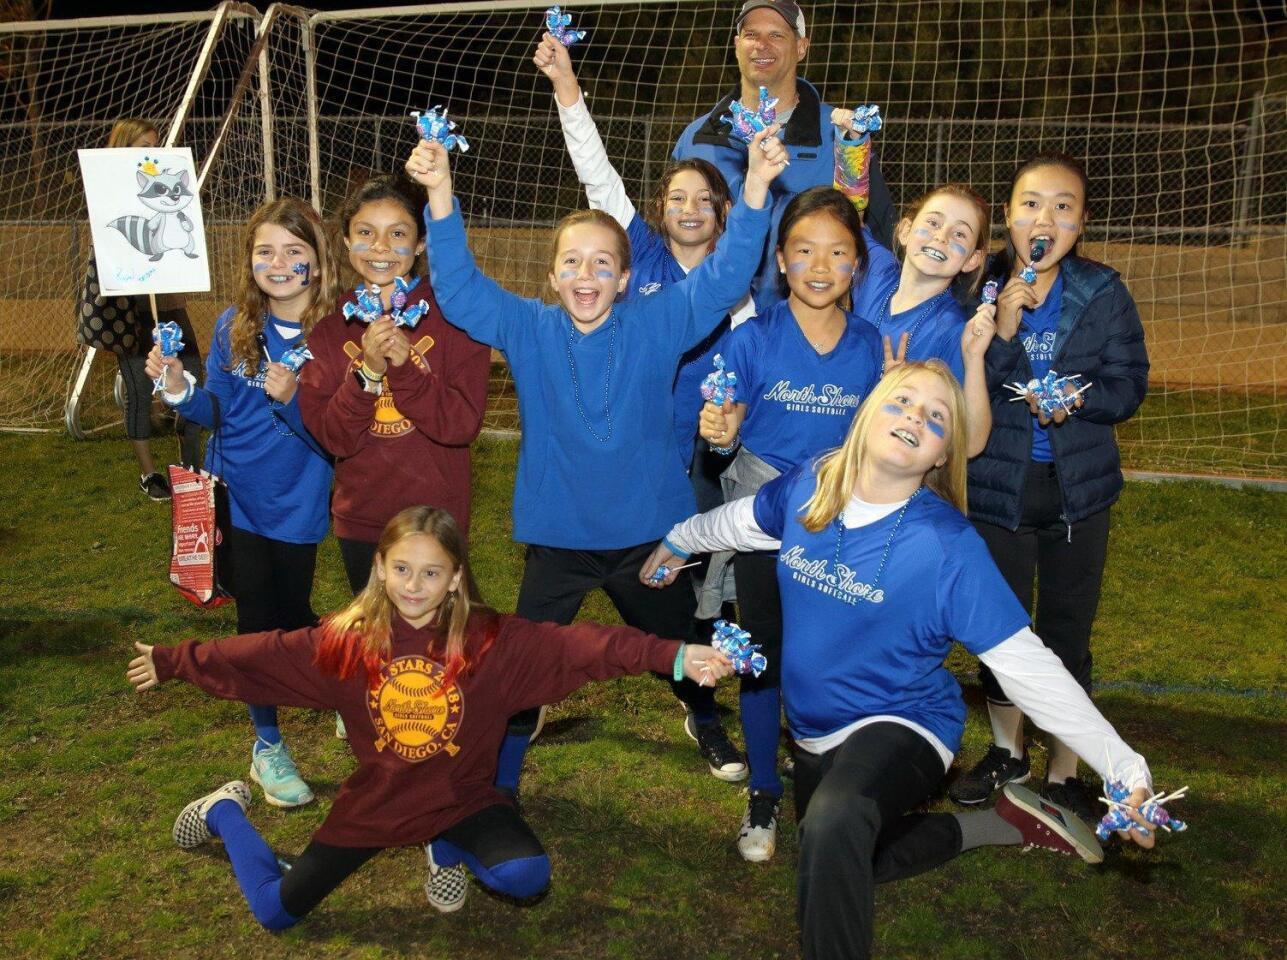 North Shore Girls Softball League Opening Night Celebration